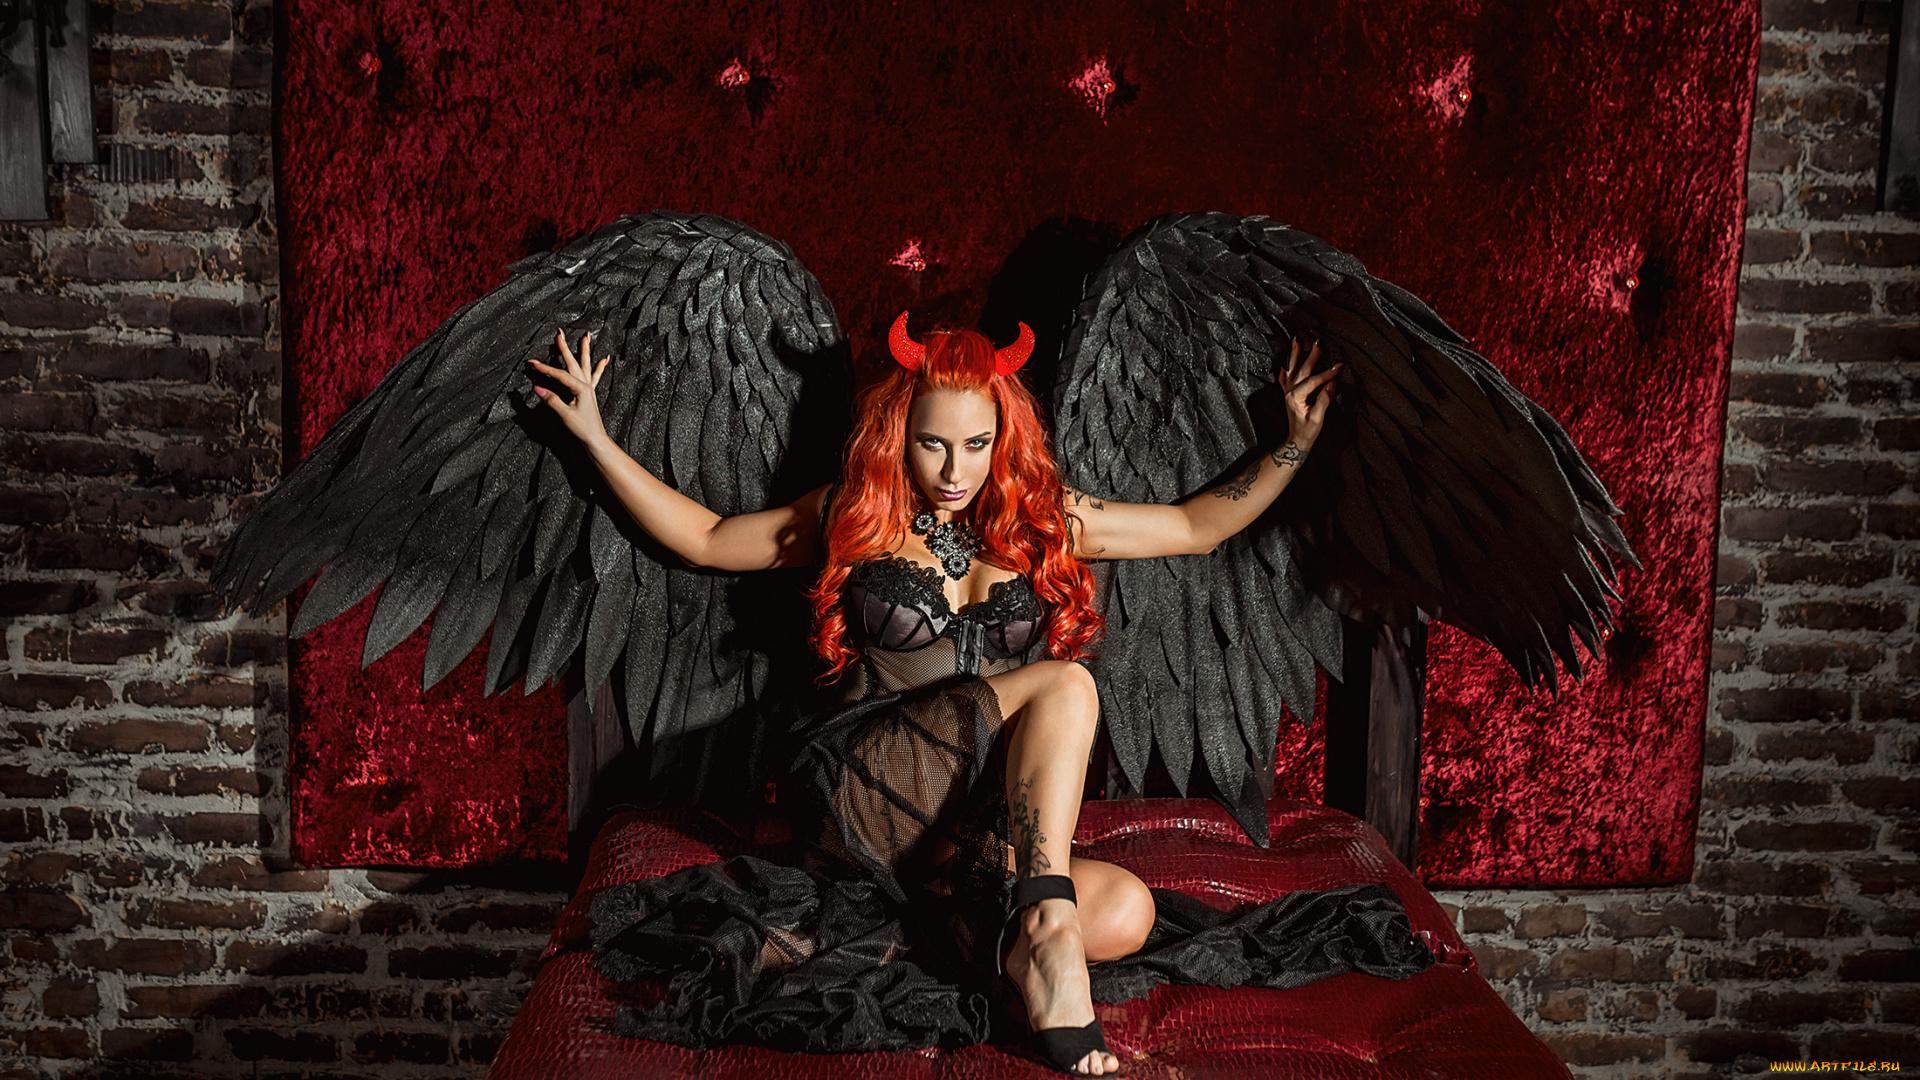 Картинки на тему девочки дьяволы